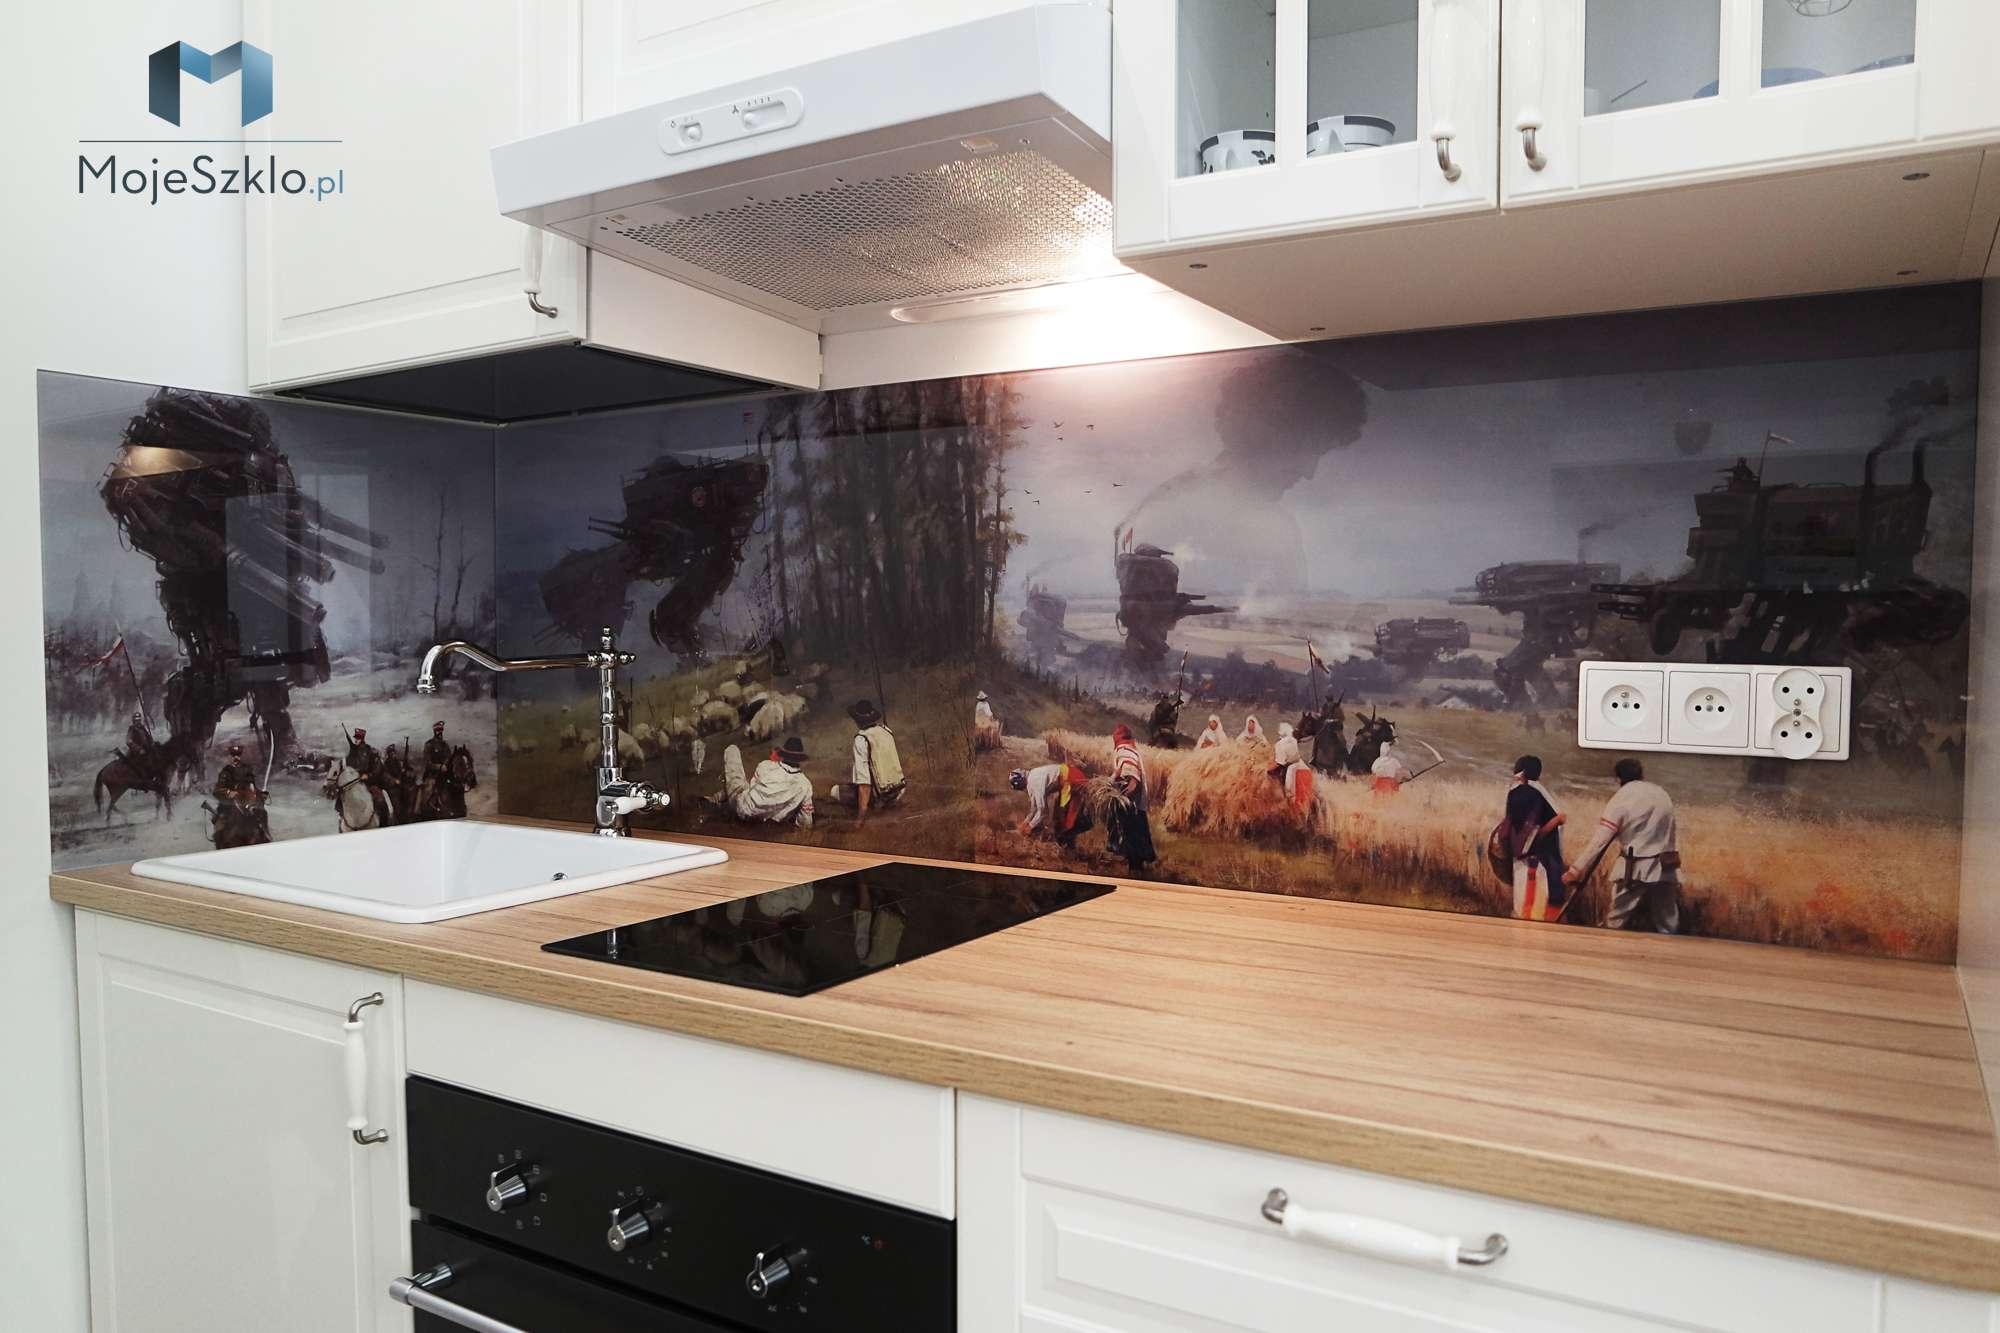 Panel Szklany Do Kuchni Rozalski - Panel szklany do kuchni z grafiką i rysunkiem